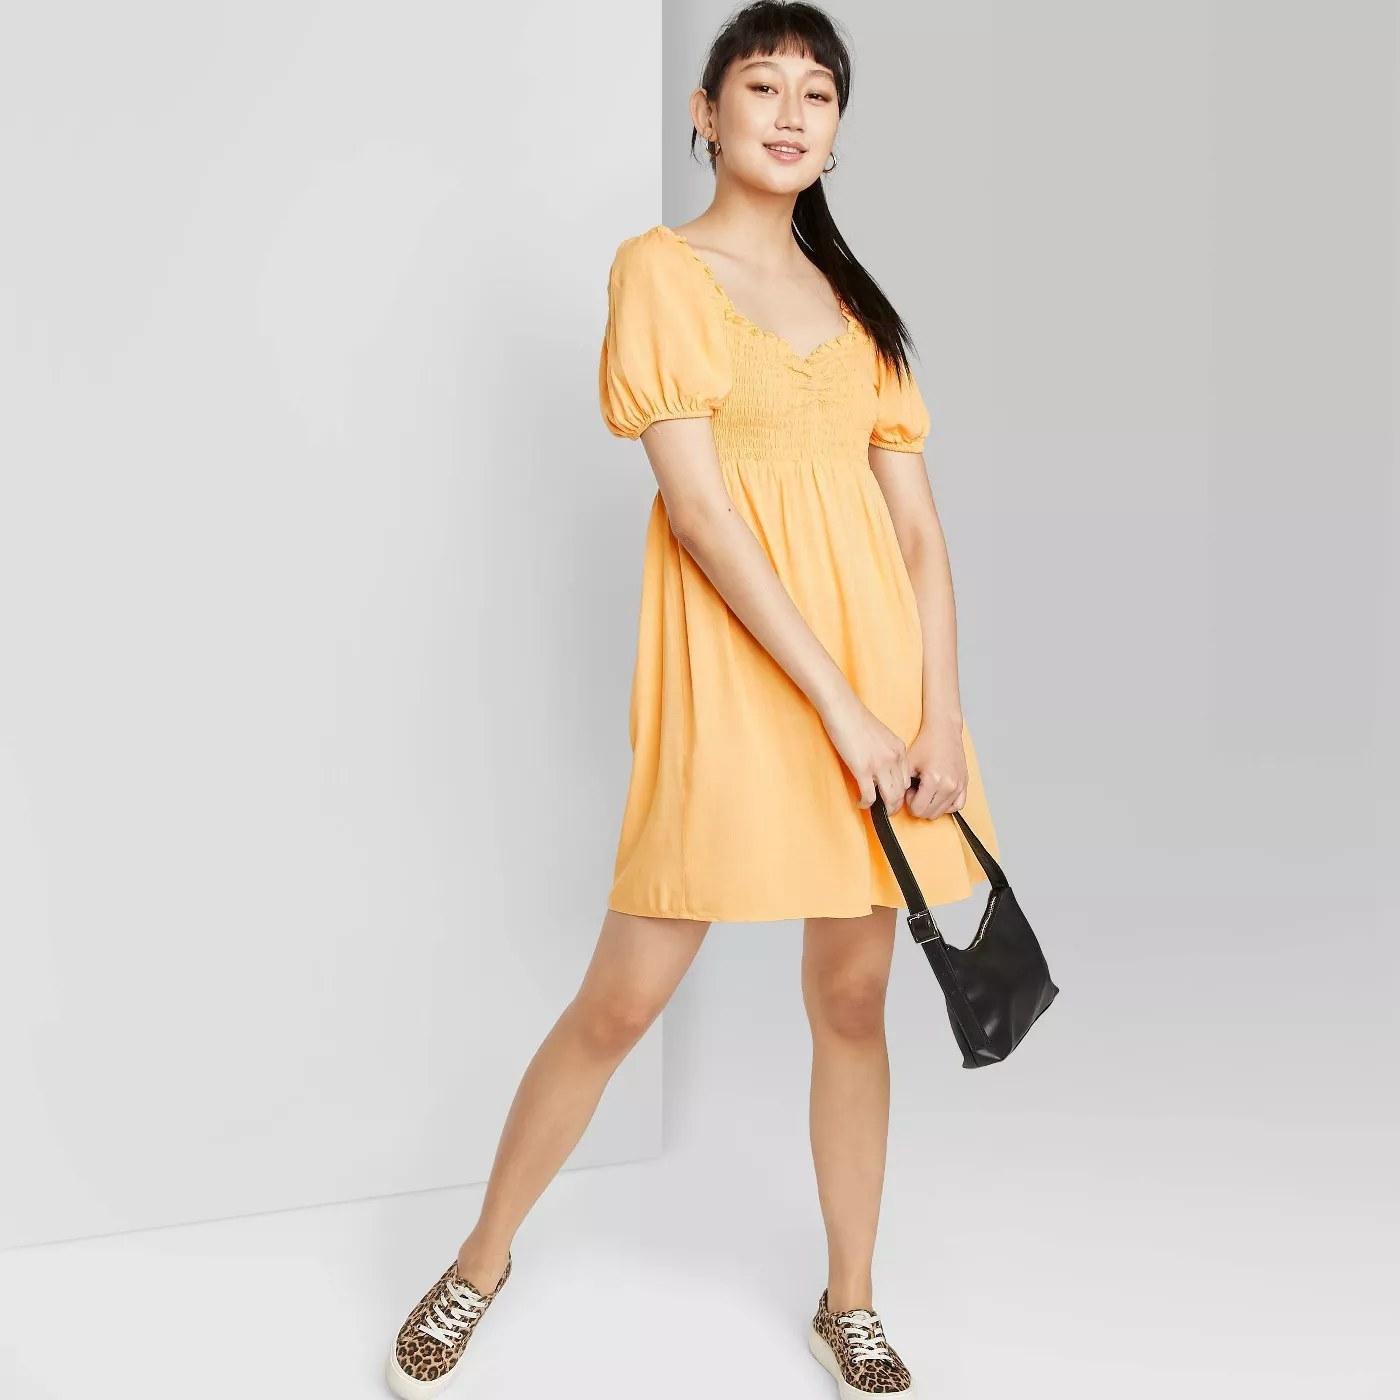 model wears yellow puff sleeved dress